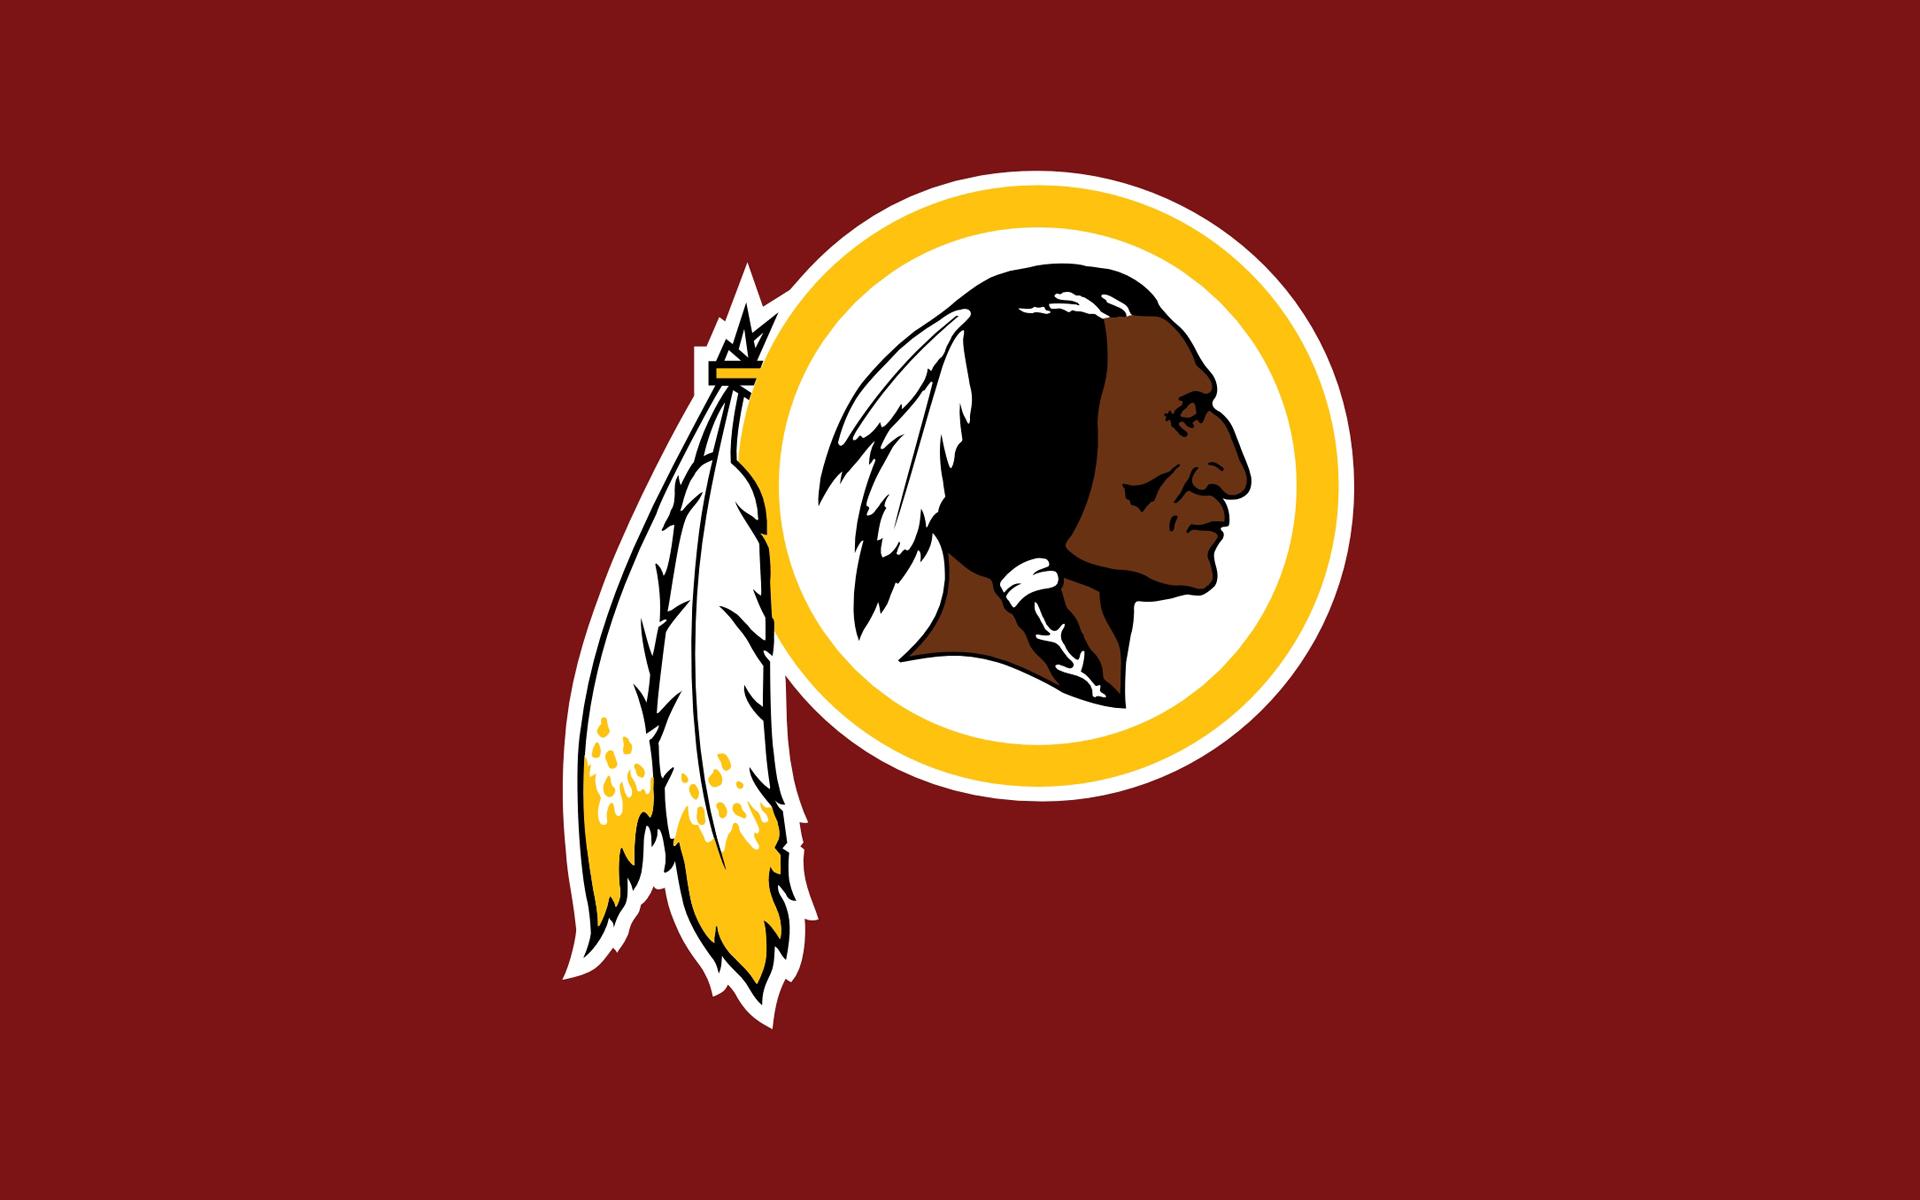 Washington Redskins flag logo 1920x1200